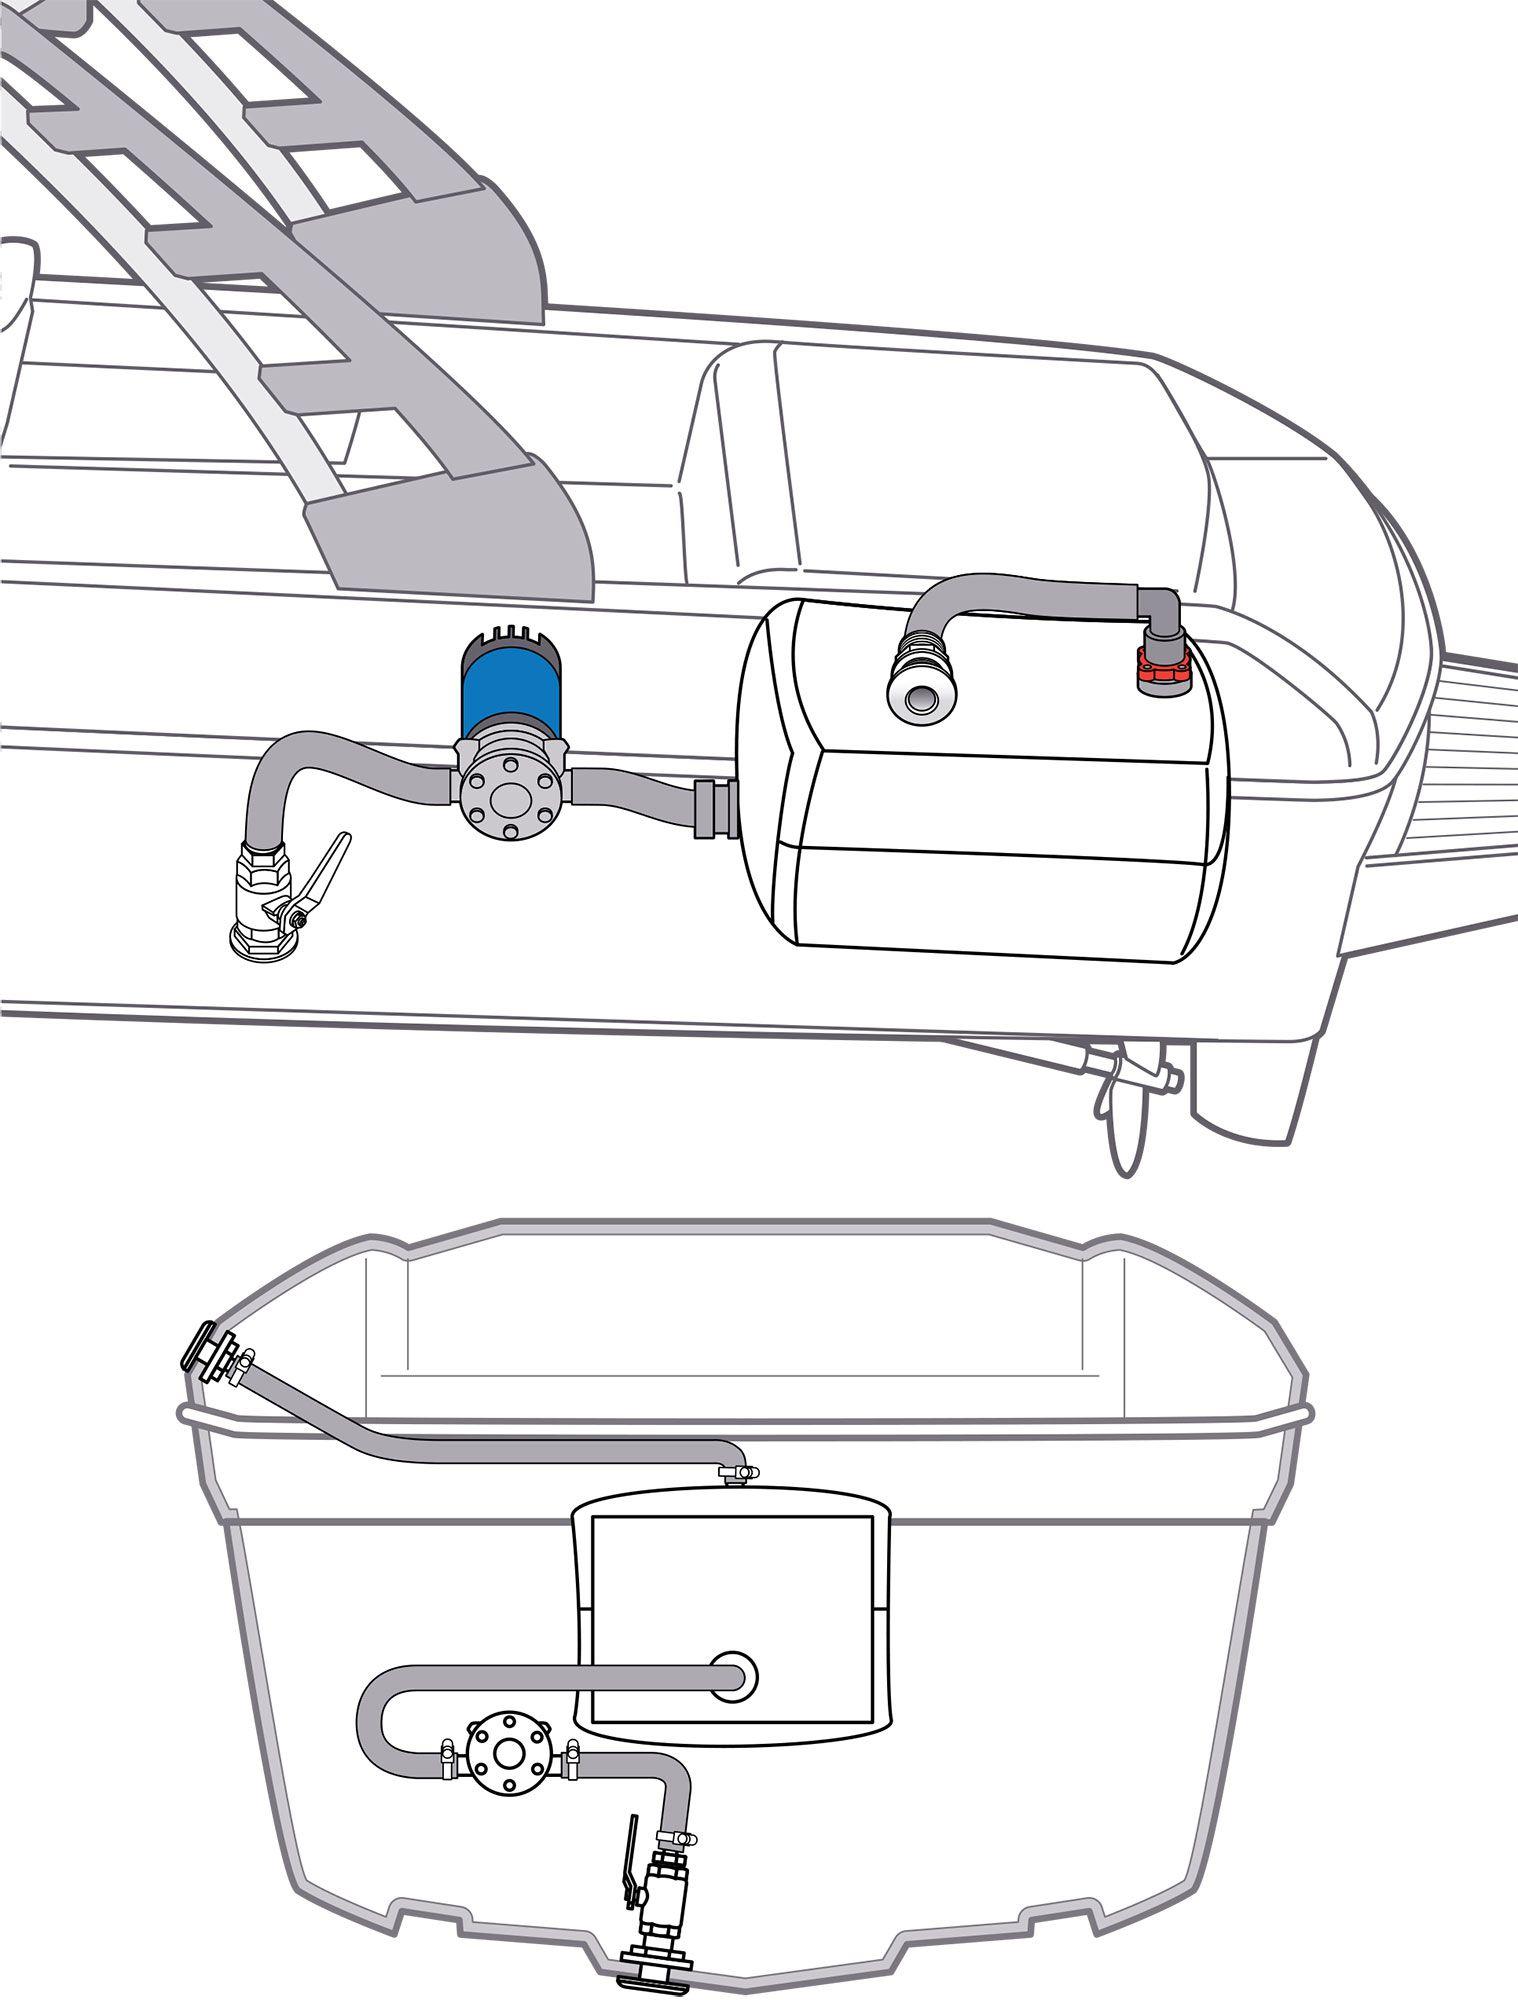 hight resolution of ski supreme boat wiring diagram